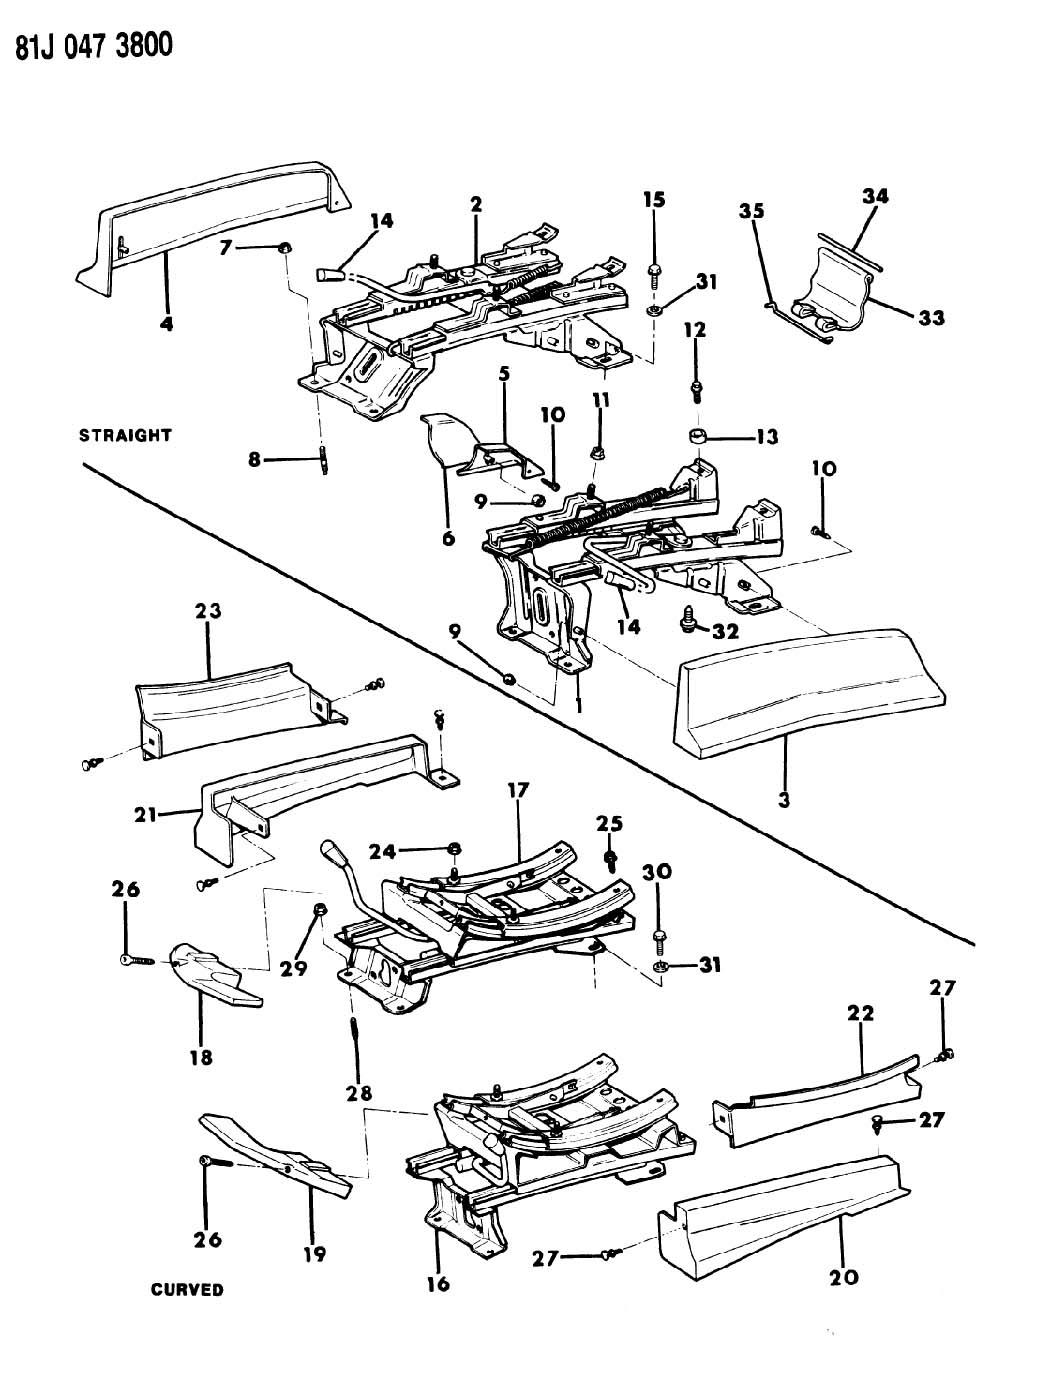 SEAT TRACK, W/O POWER SEATS BUCKET SEATS XJ CHEROKEE, XJ